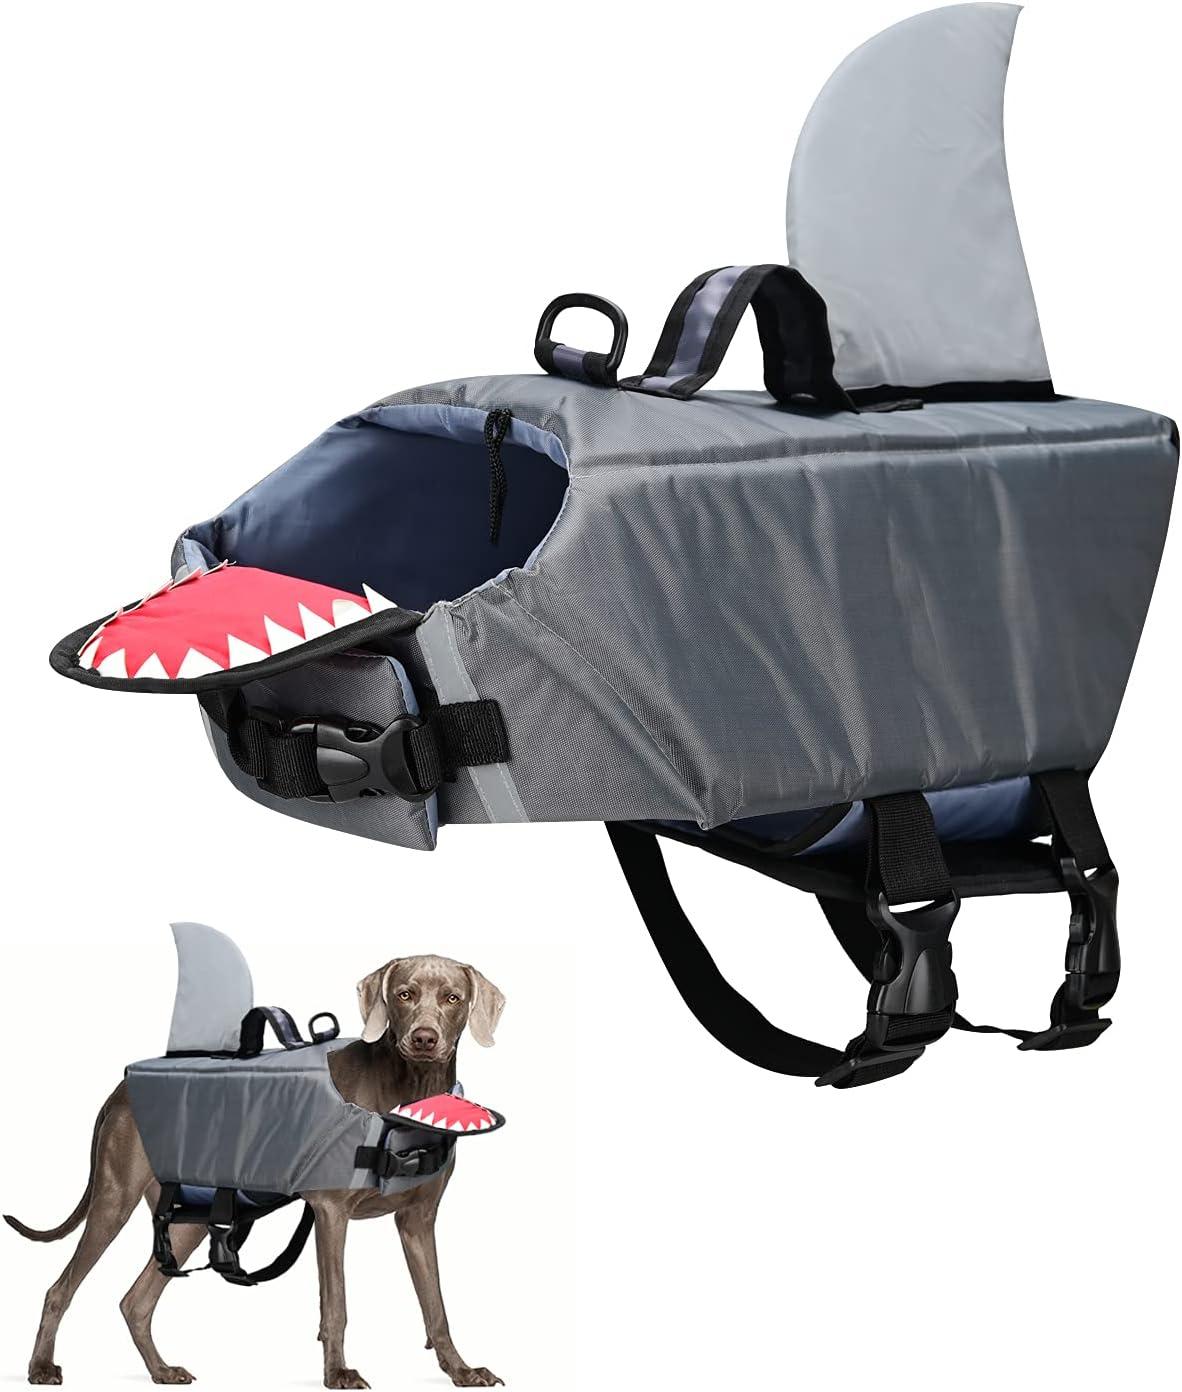 Dog Life Jacket Large special price !! Pet Fashion Safety Lychee Swimsuit Vest Flotat